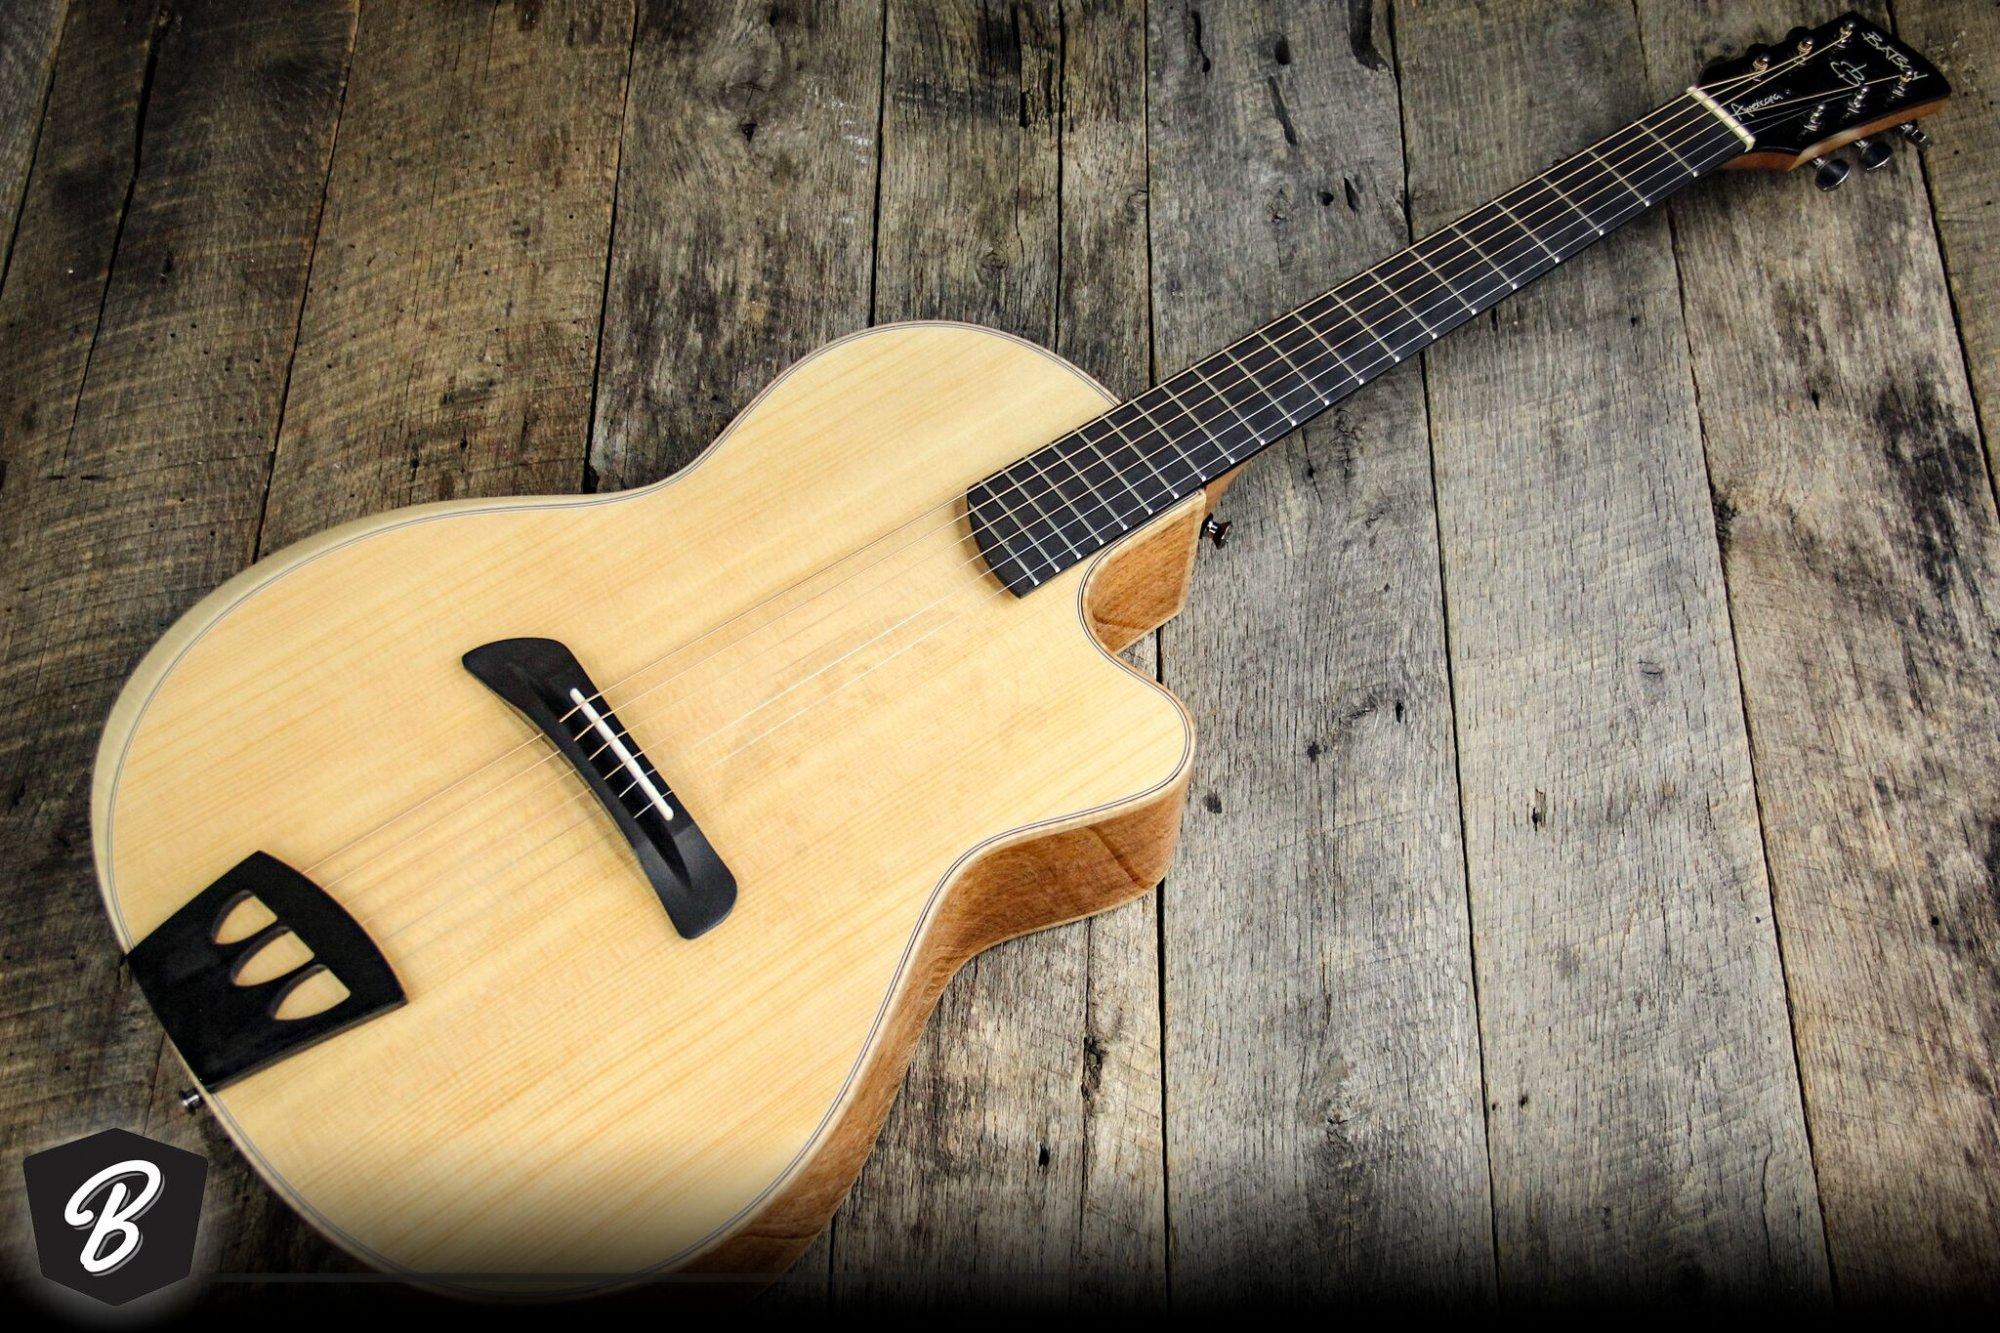 Batson Americana Acoustic Electric Guitar in Gloss Finish w/Hardshell Case